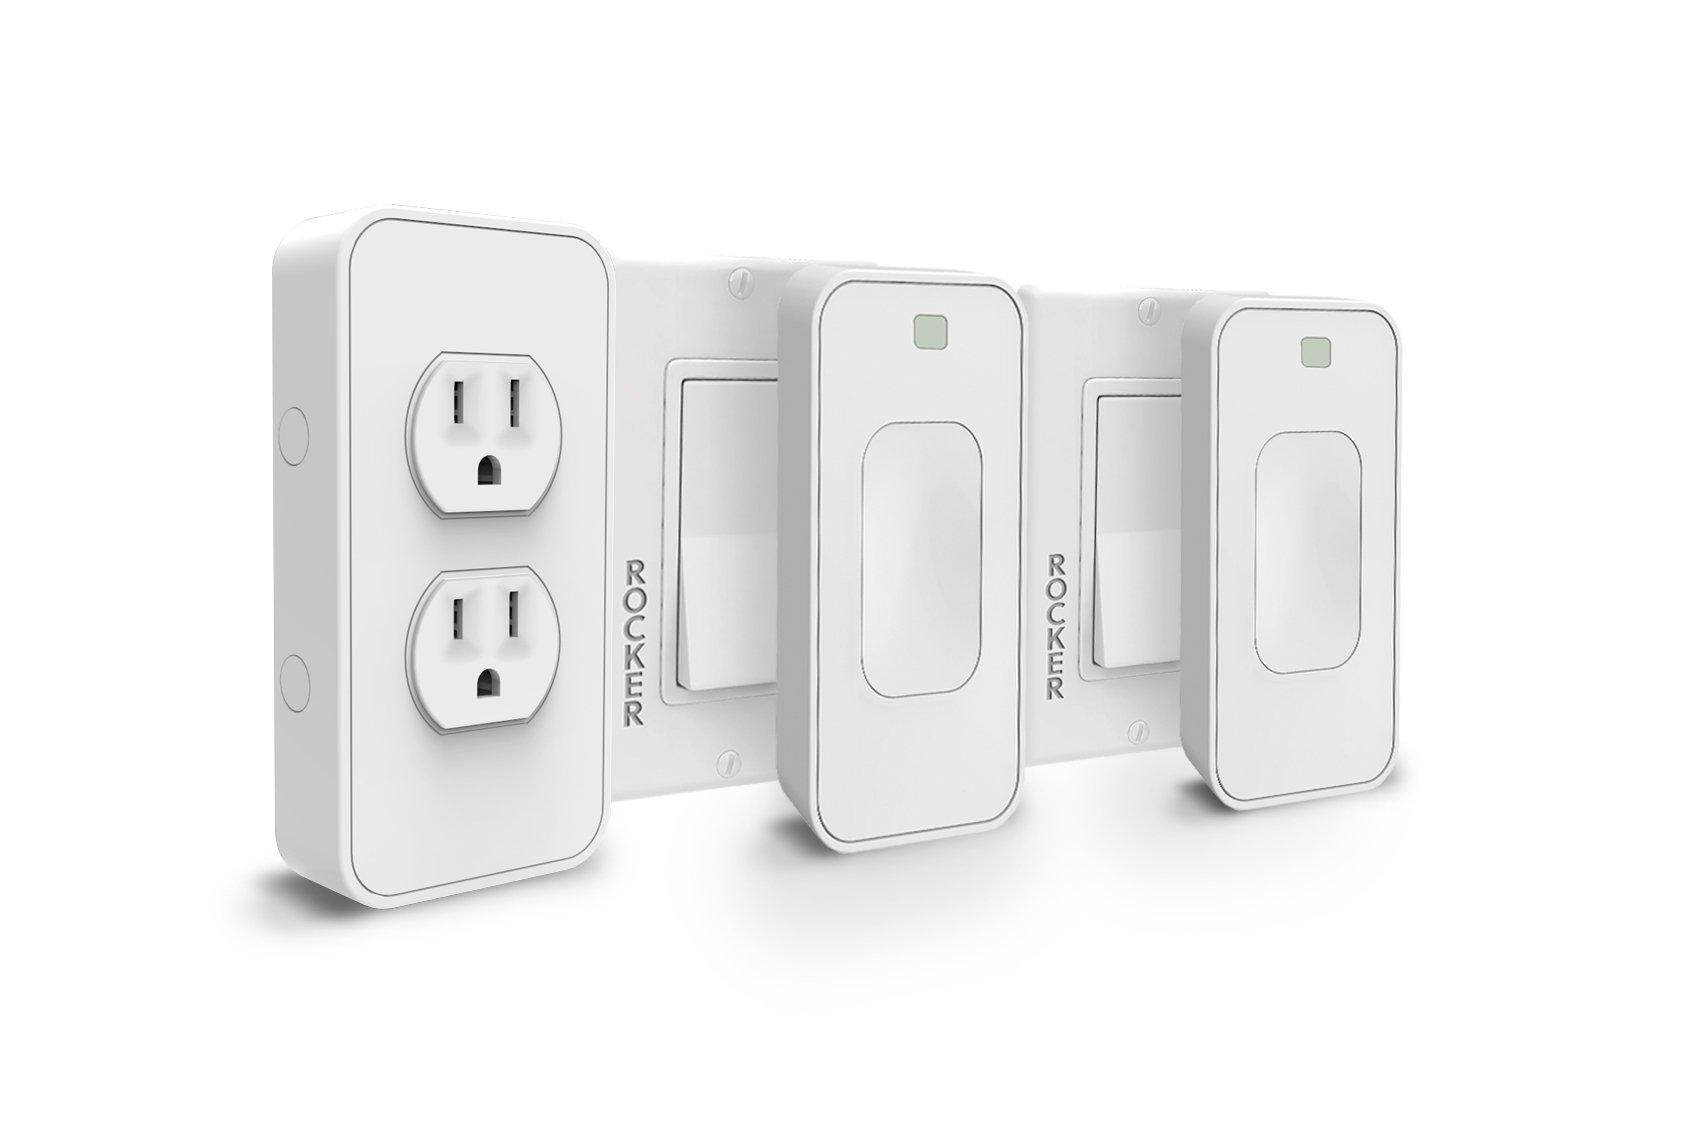 Switchmate Snap-On Smart Light Switch and Instant Smart Power Outlet That Listen - SKLPP00R8 Rocker Kit